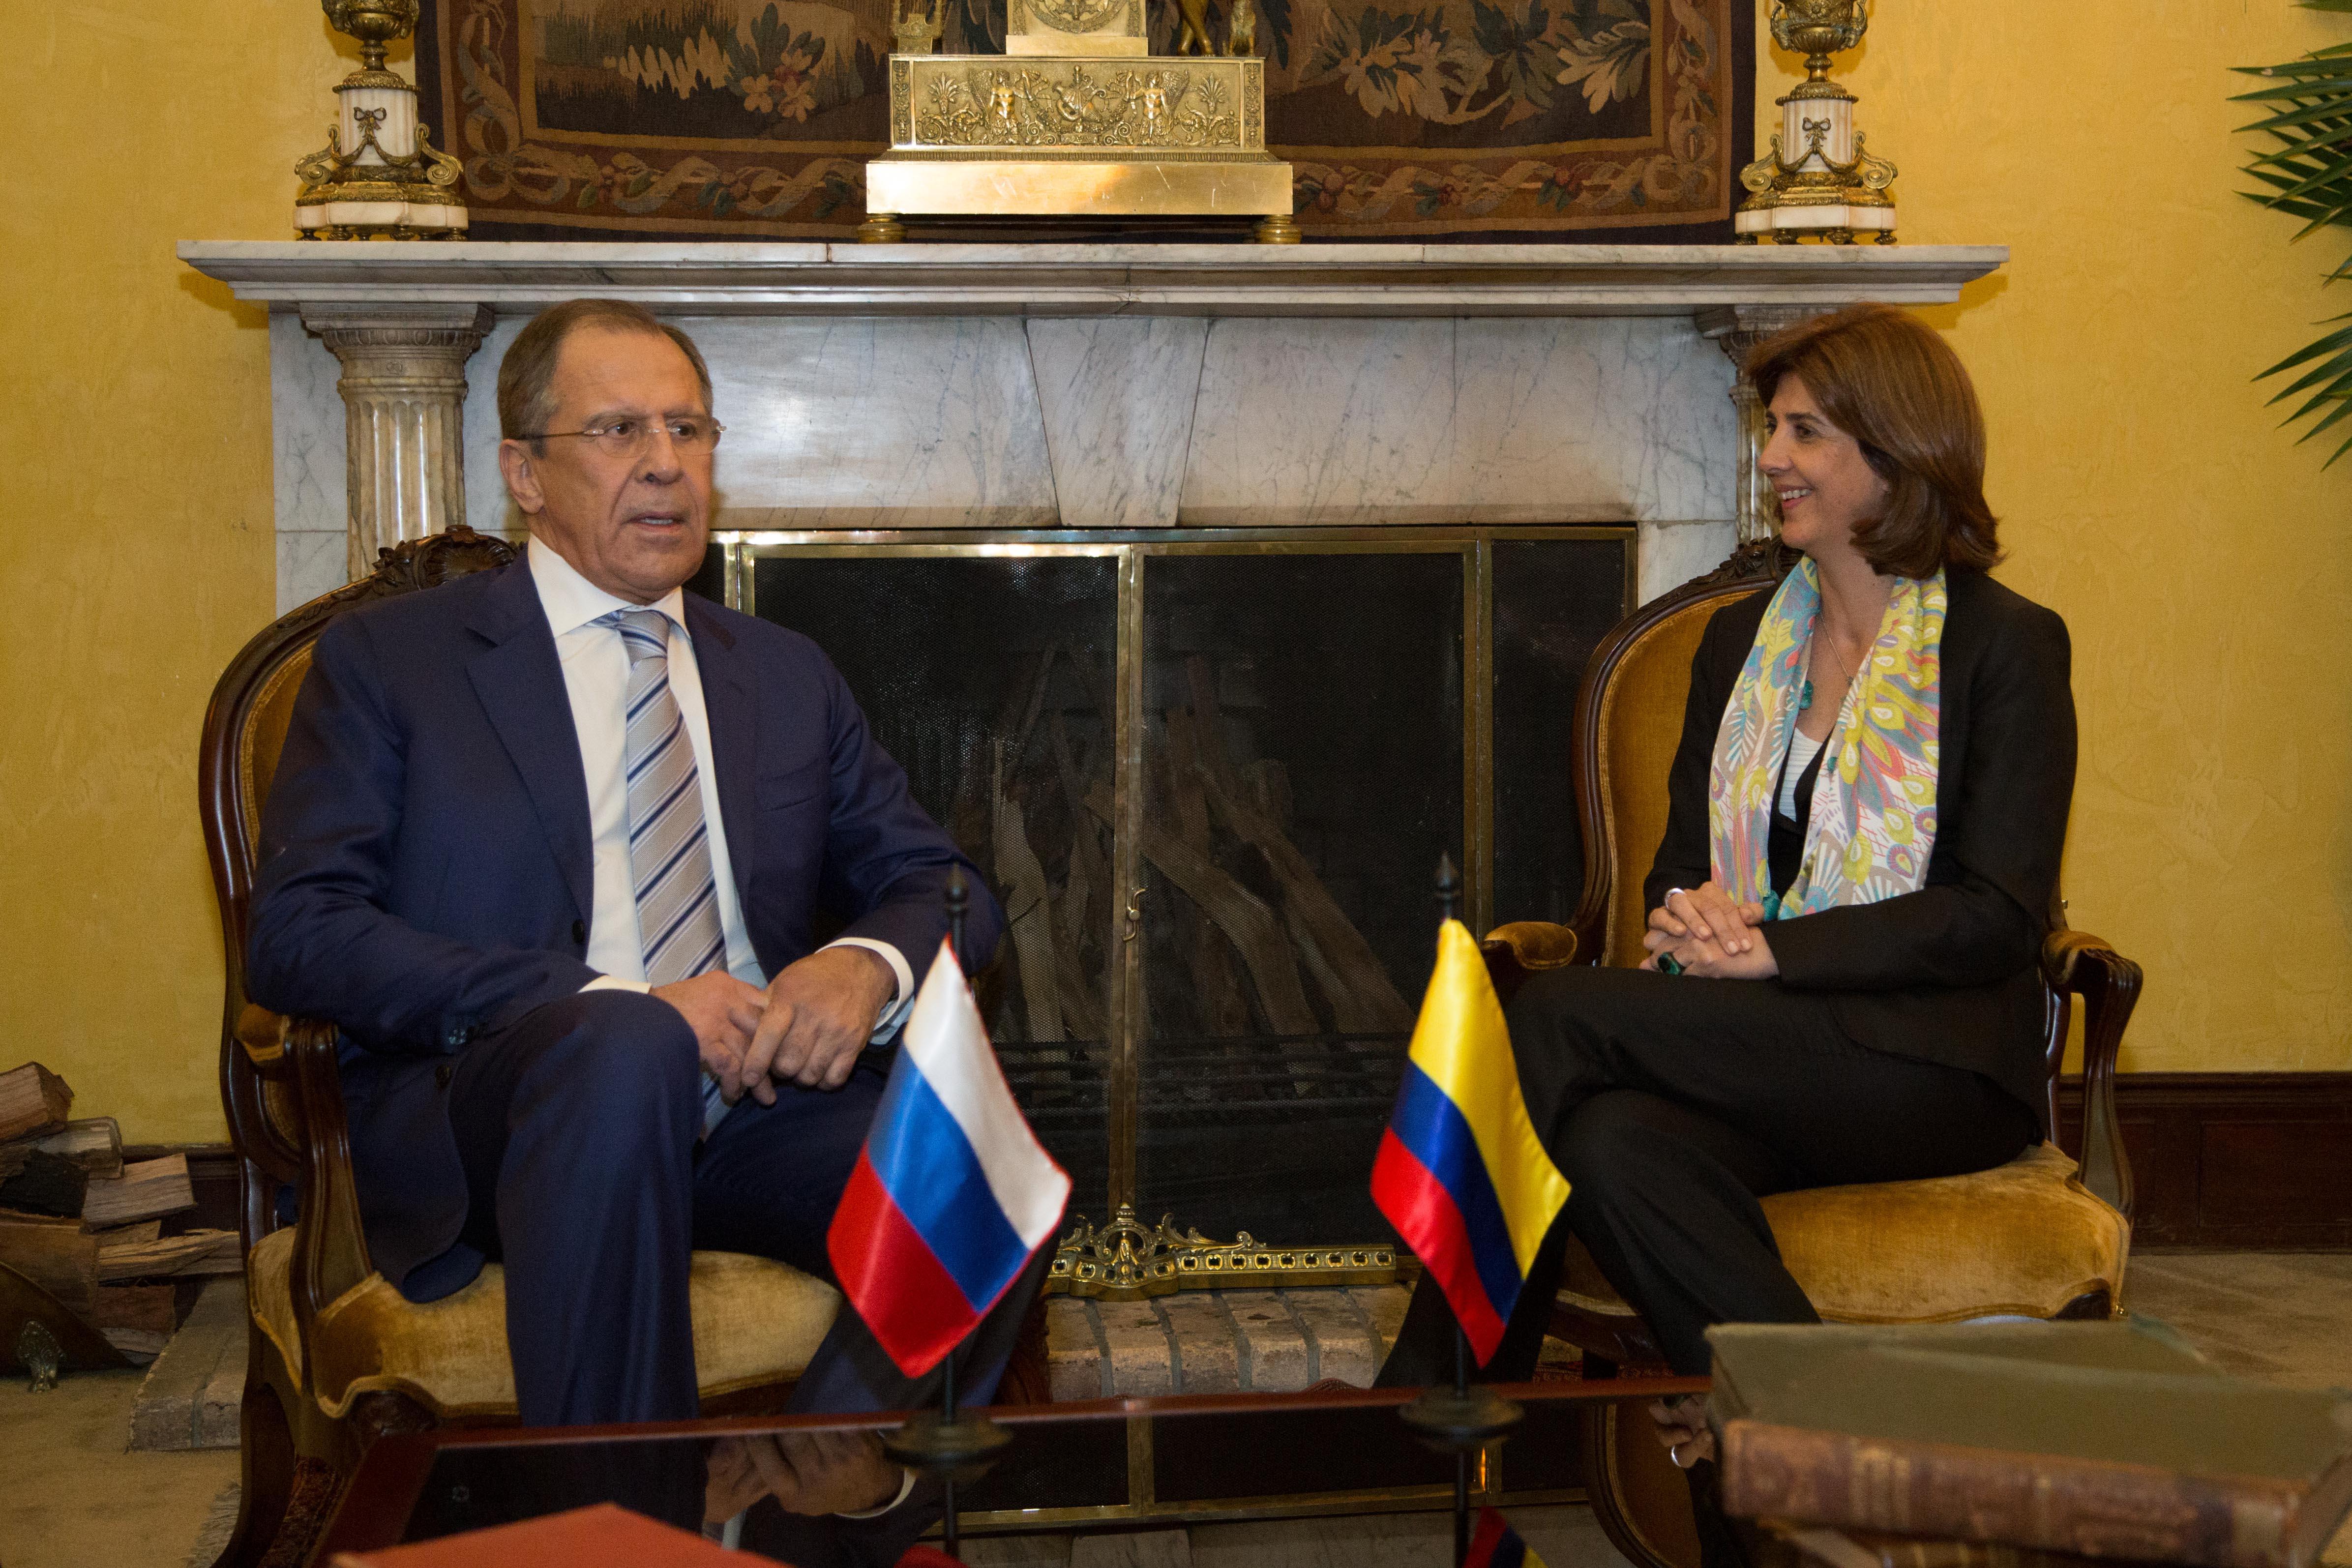 Ministerio De Relaciones Exteriores Noticias Share The Knownledge